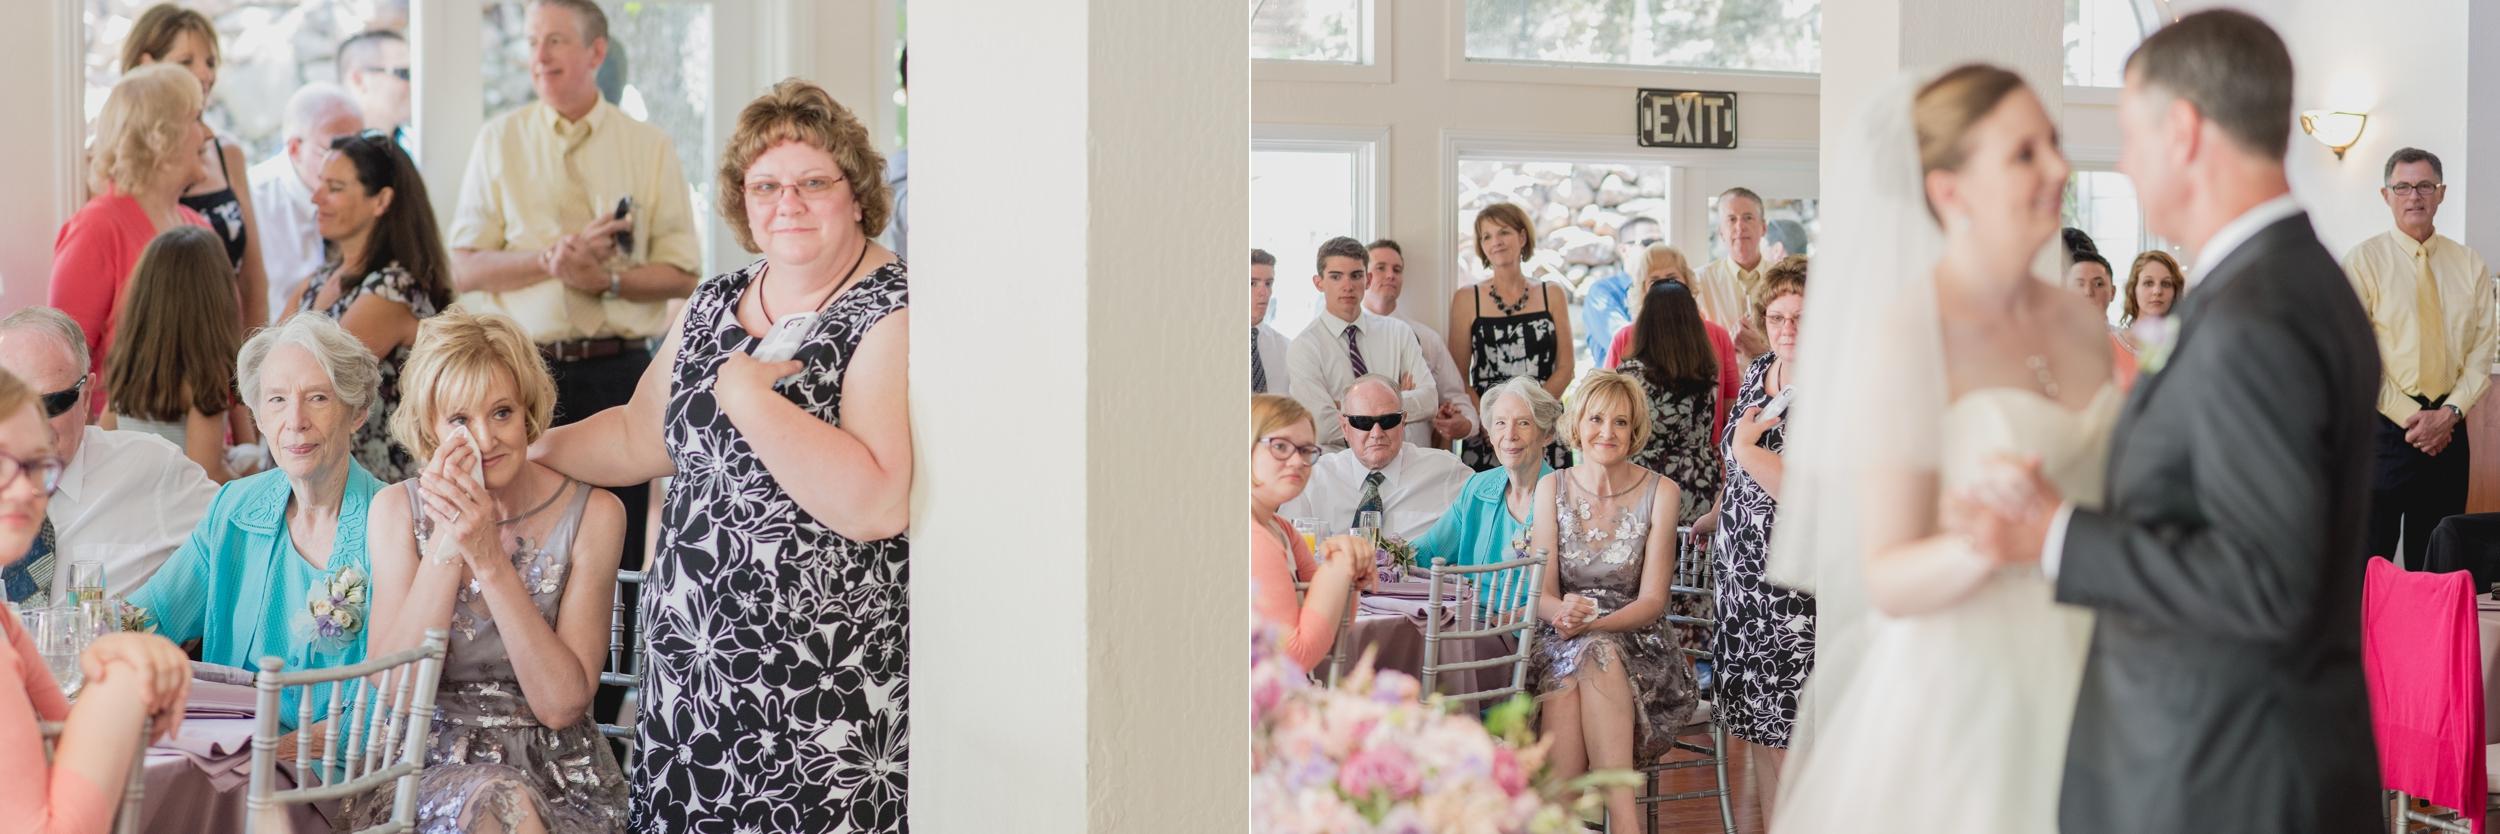 elliston-vineyards-morning-wedding-vivianchen-051_WEB.jpg